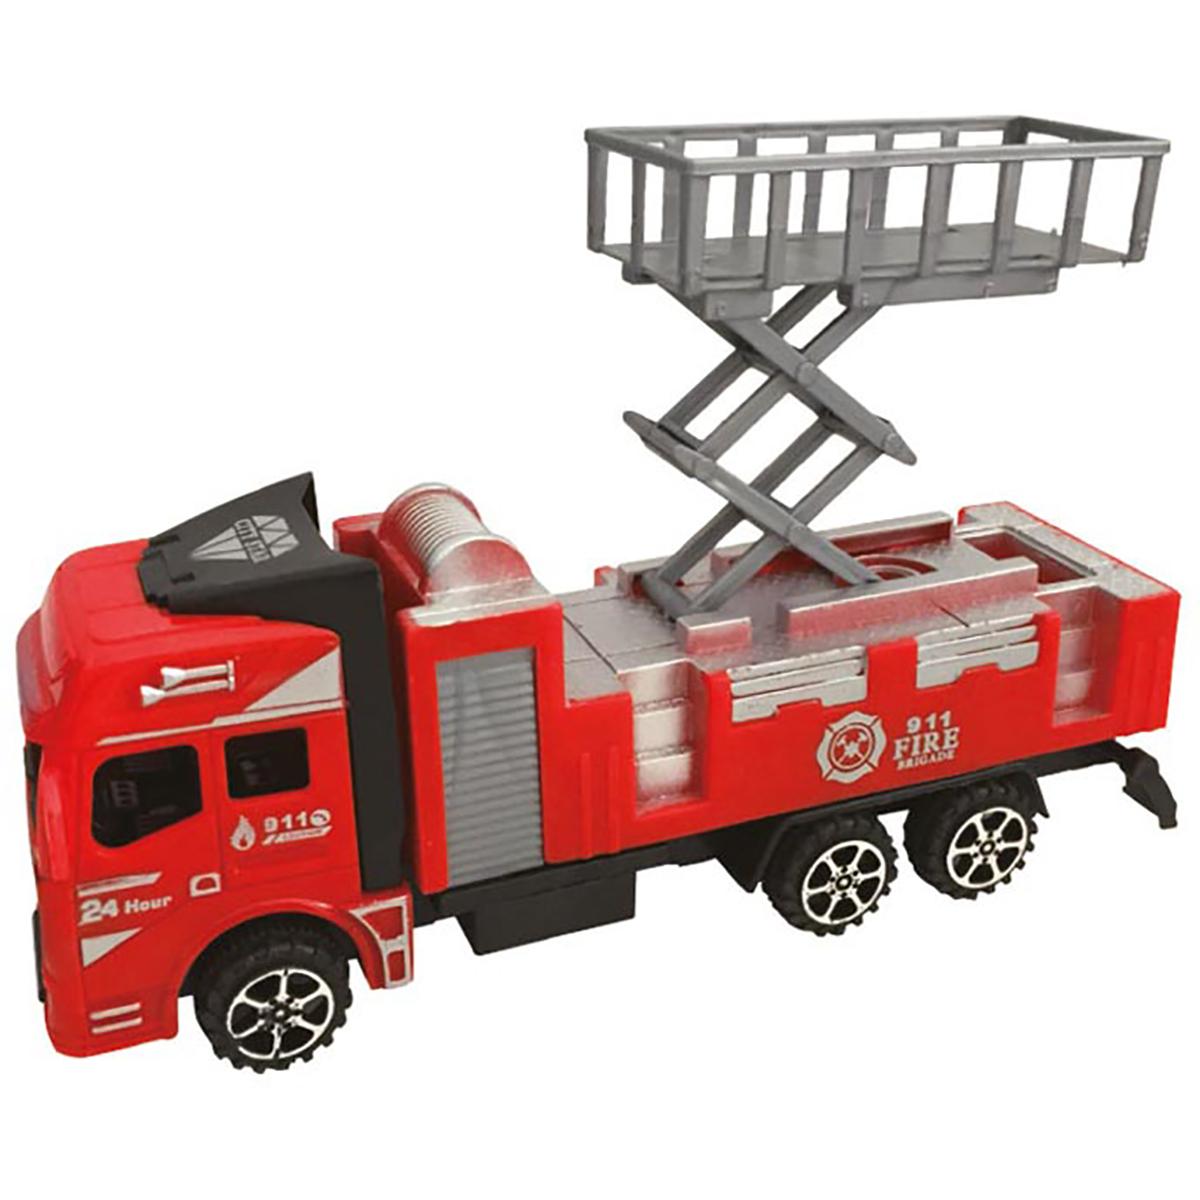 Masinuta de pompieri Unika Toy, Rosu, 20 cm